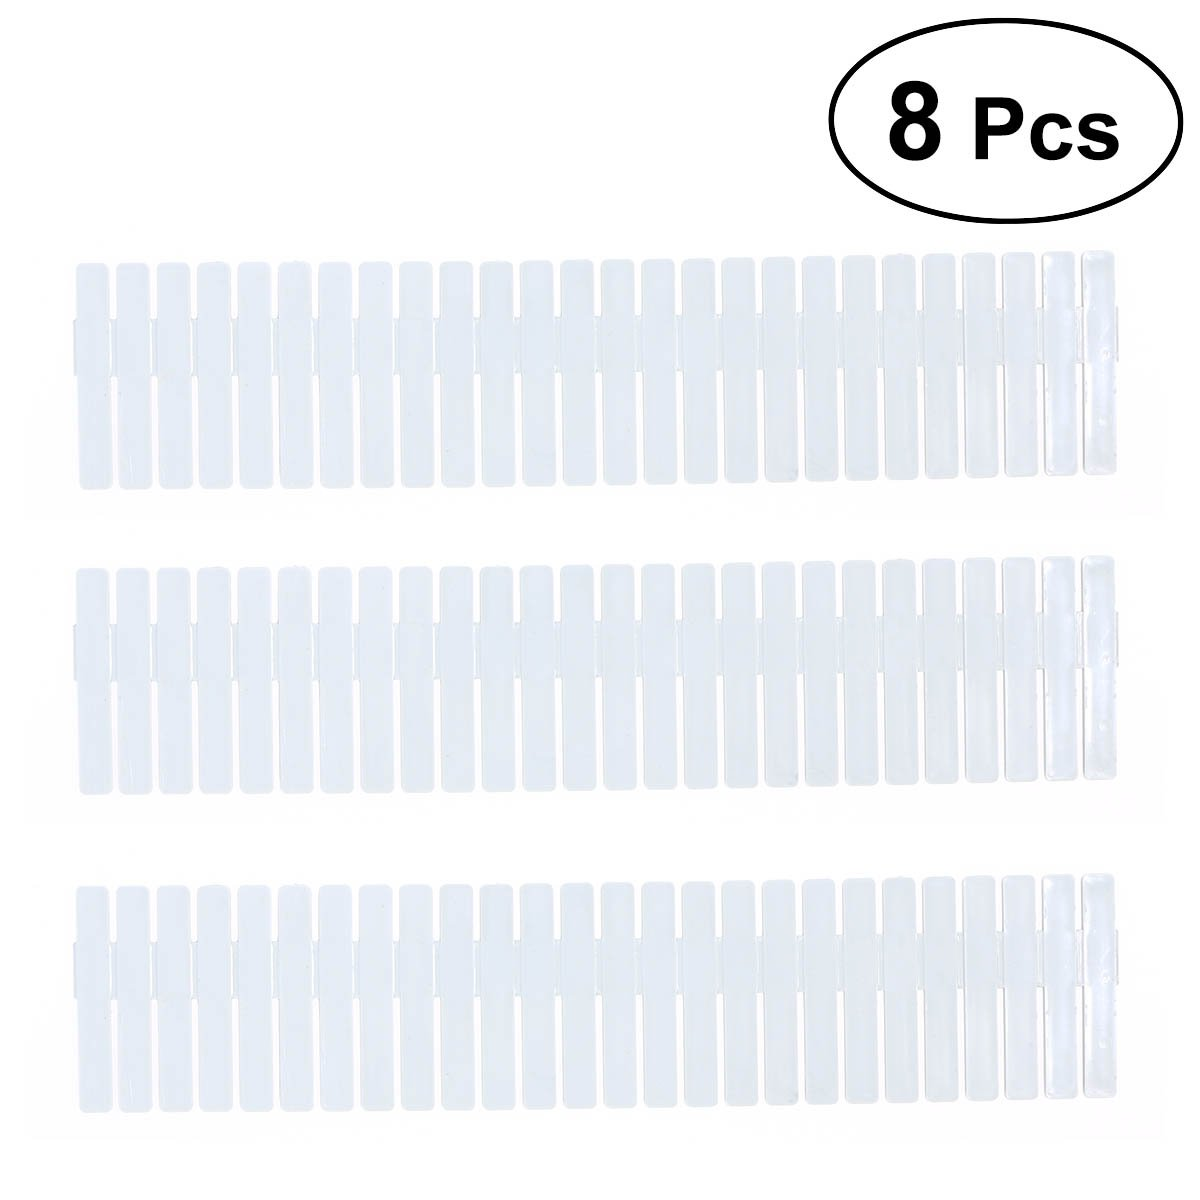 OUNONA DIY Plastic Drawer Organizer Dividers for Dresser Storage Household StoraCloset Makeup Socks Underwear Scarves Home Tidy 32.2 x 7cm 8PCS (Sky-blue)